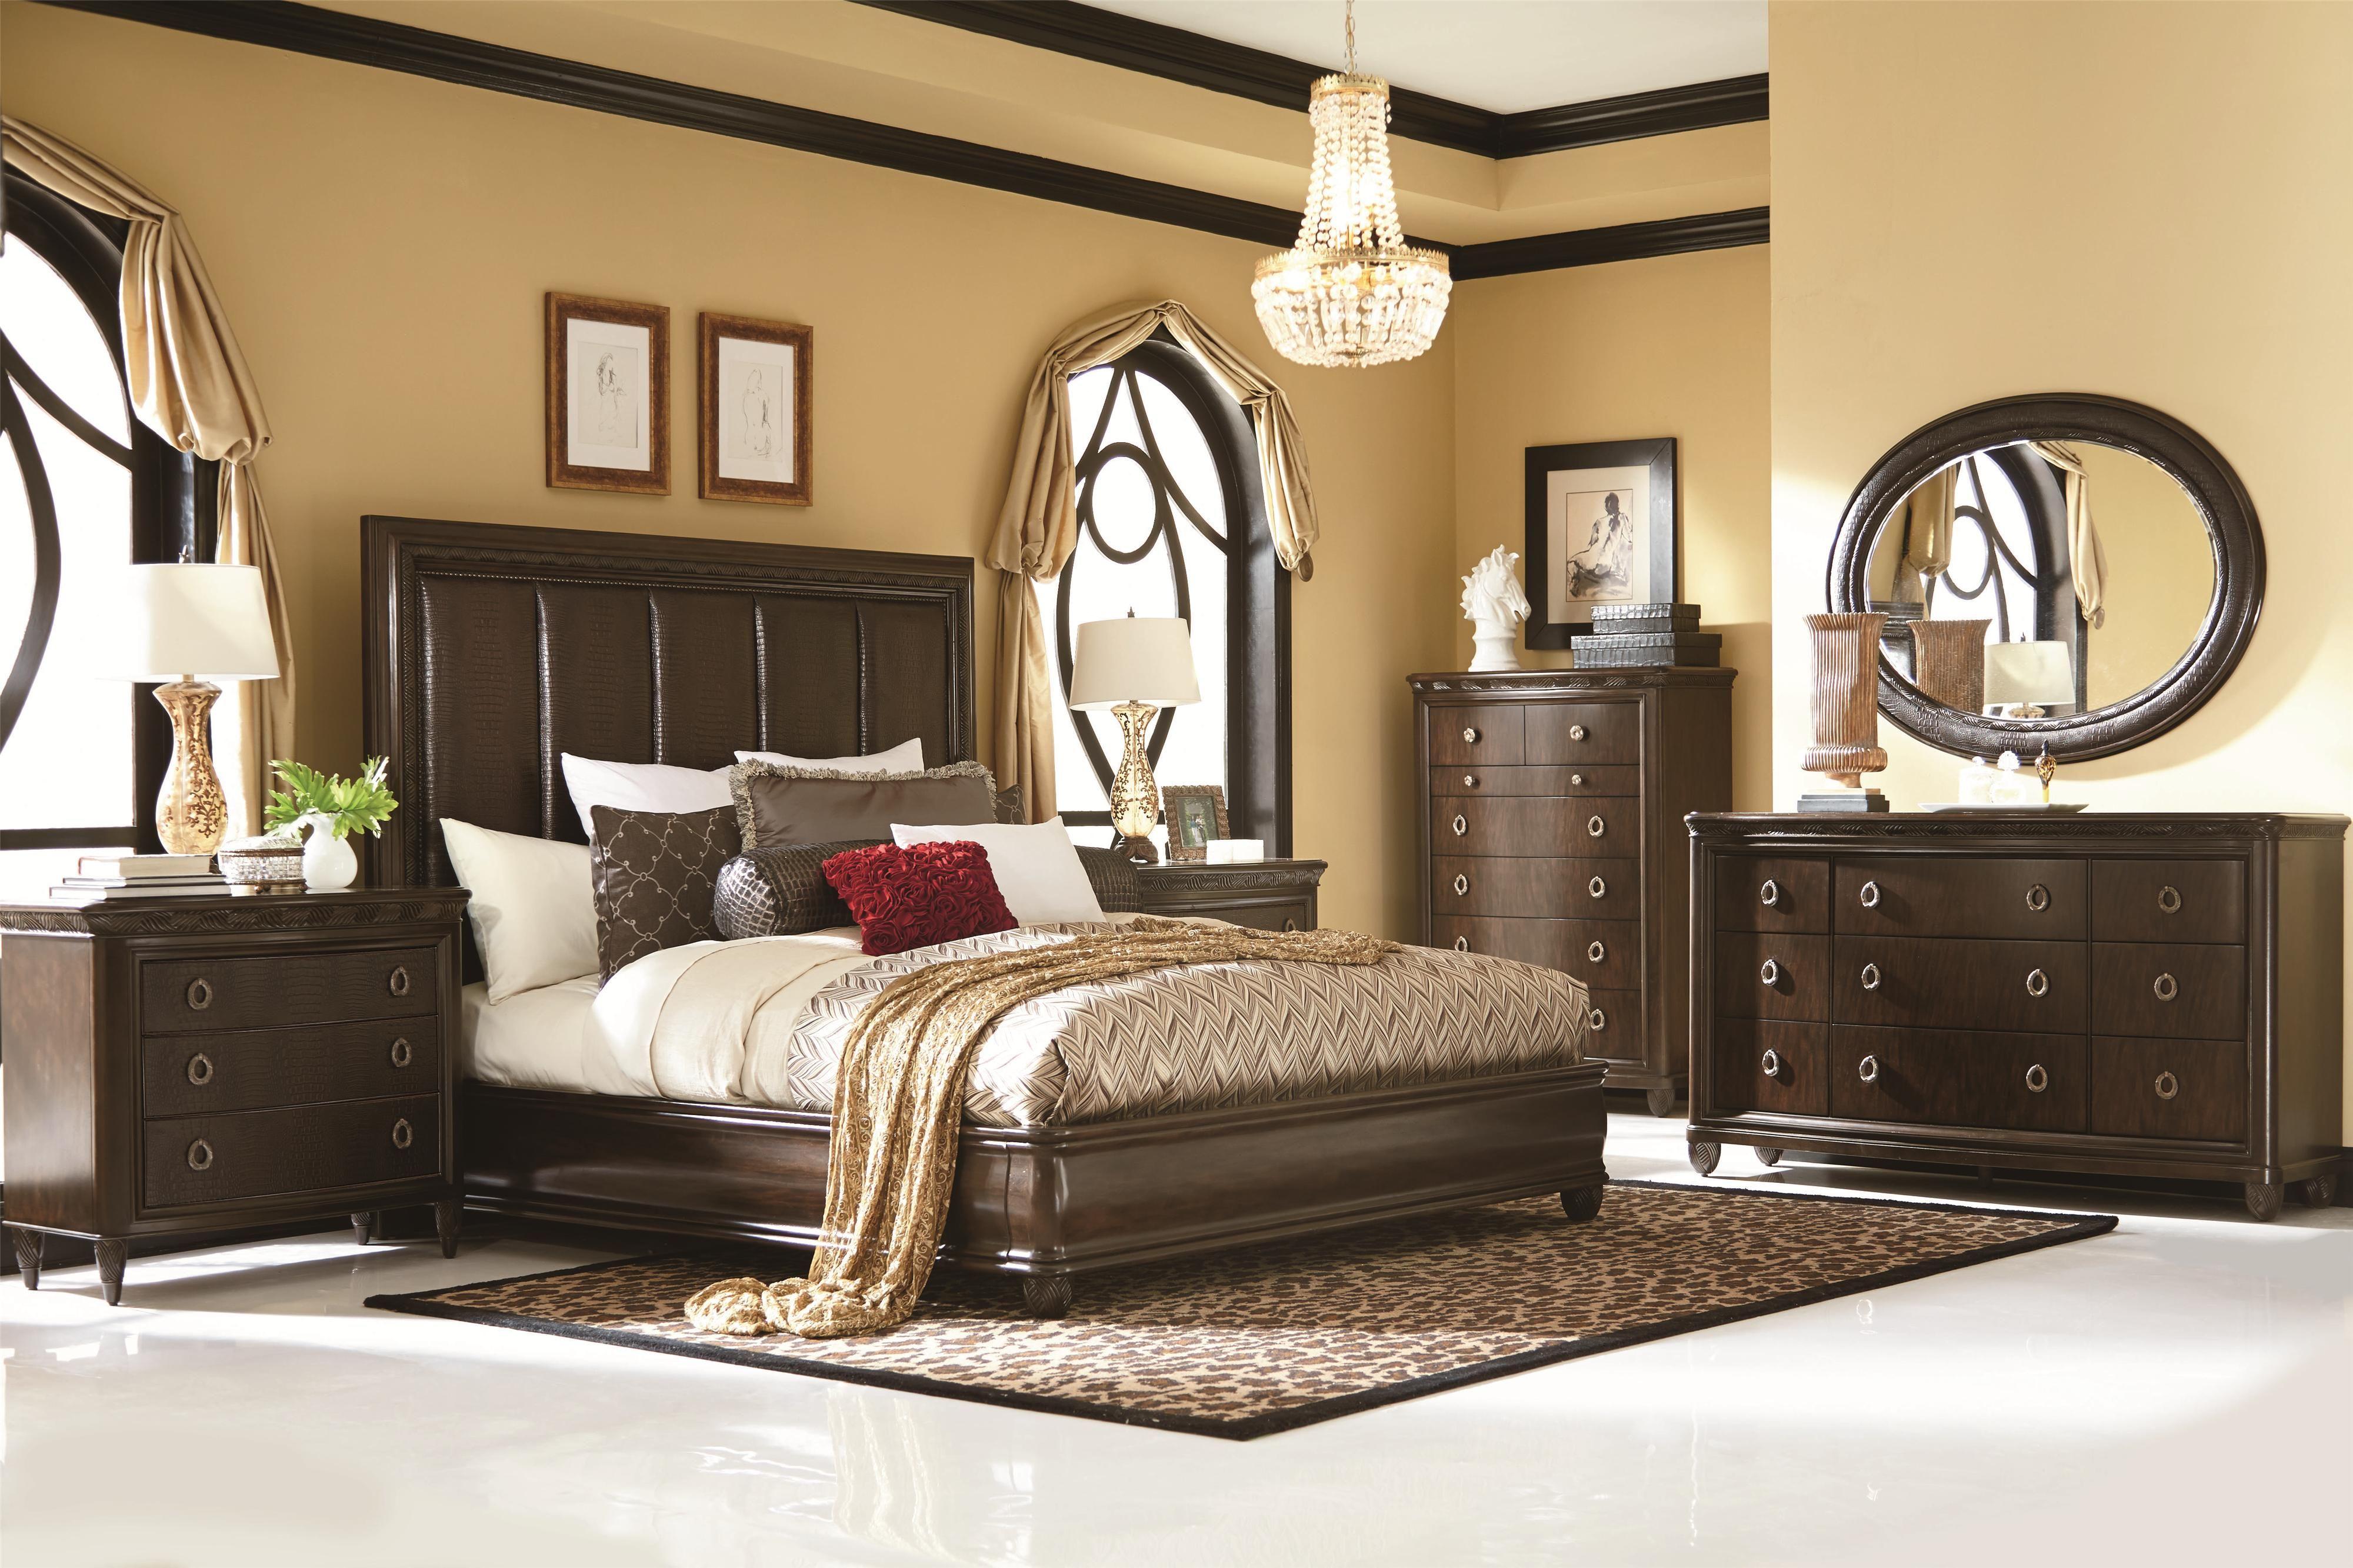 Bob Mackie Home King Bedroom Group 3 by American Drew | Romantic ...